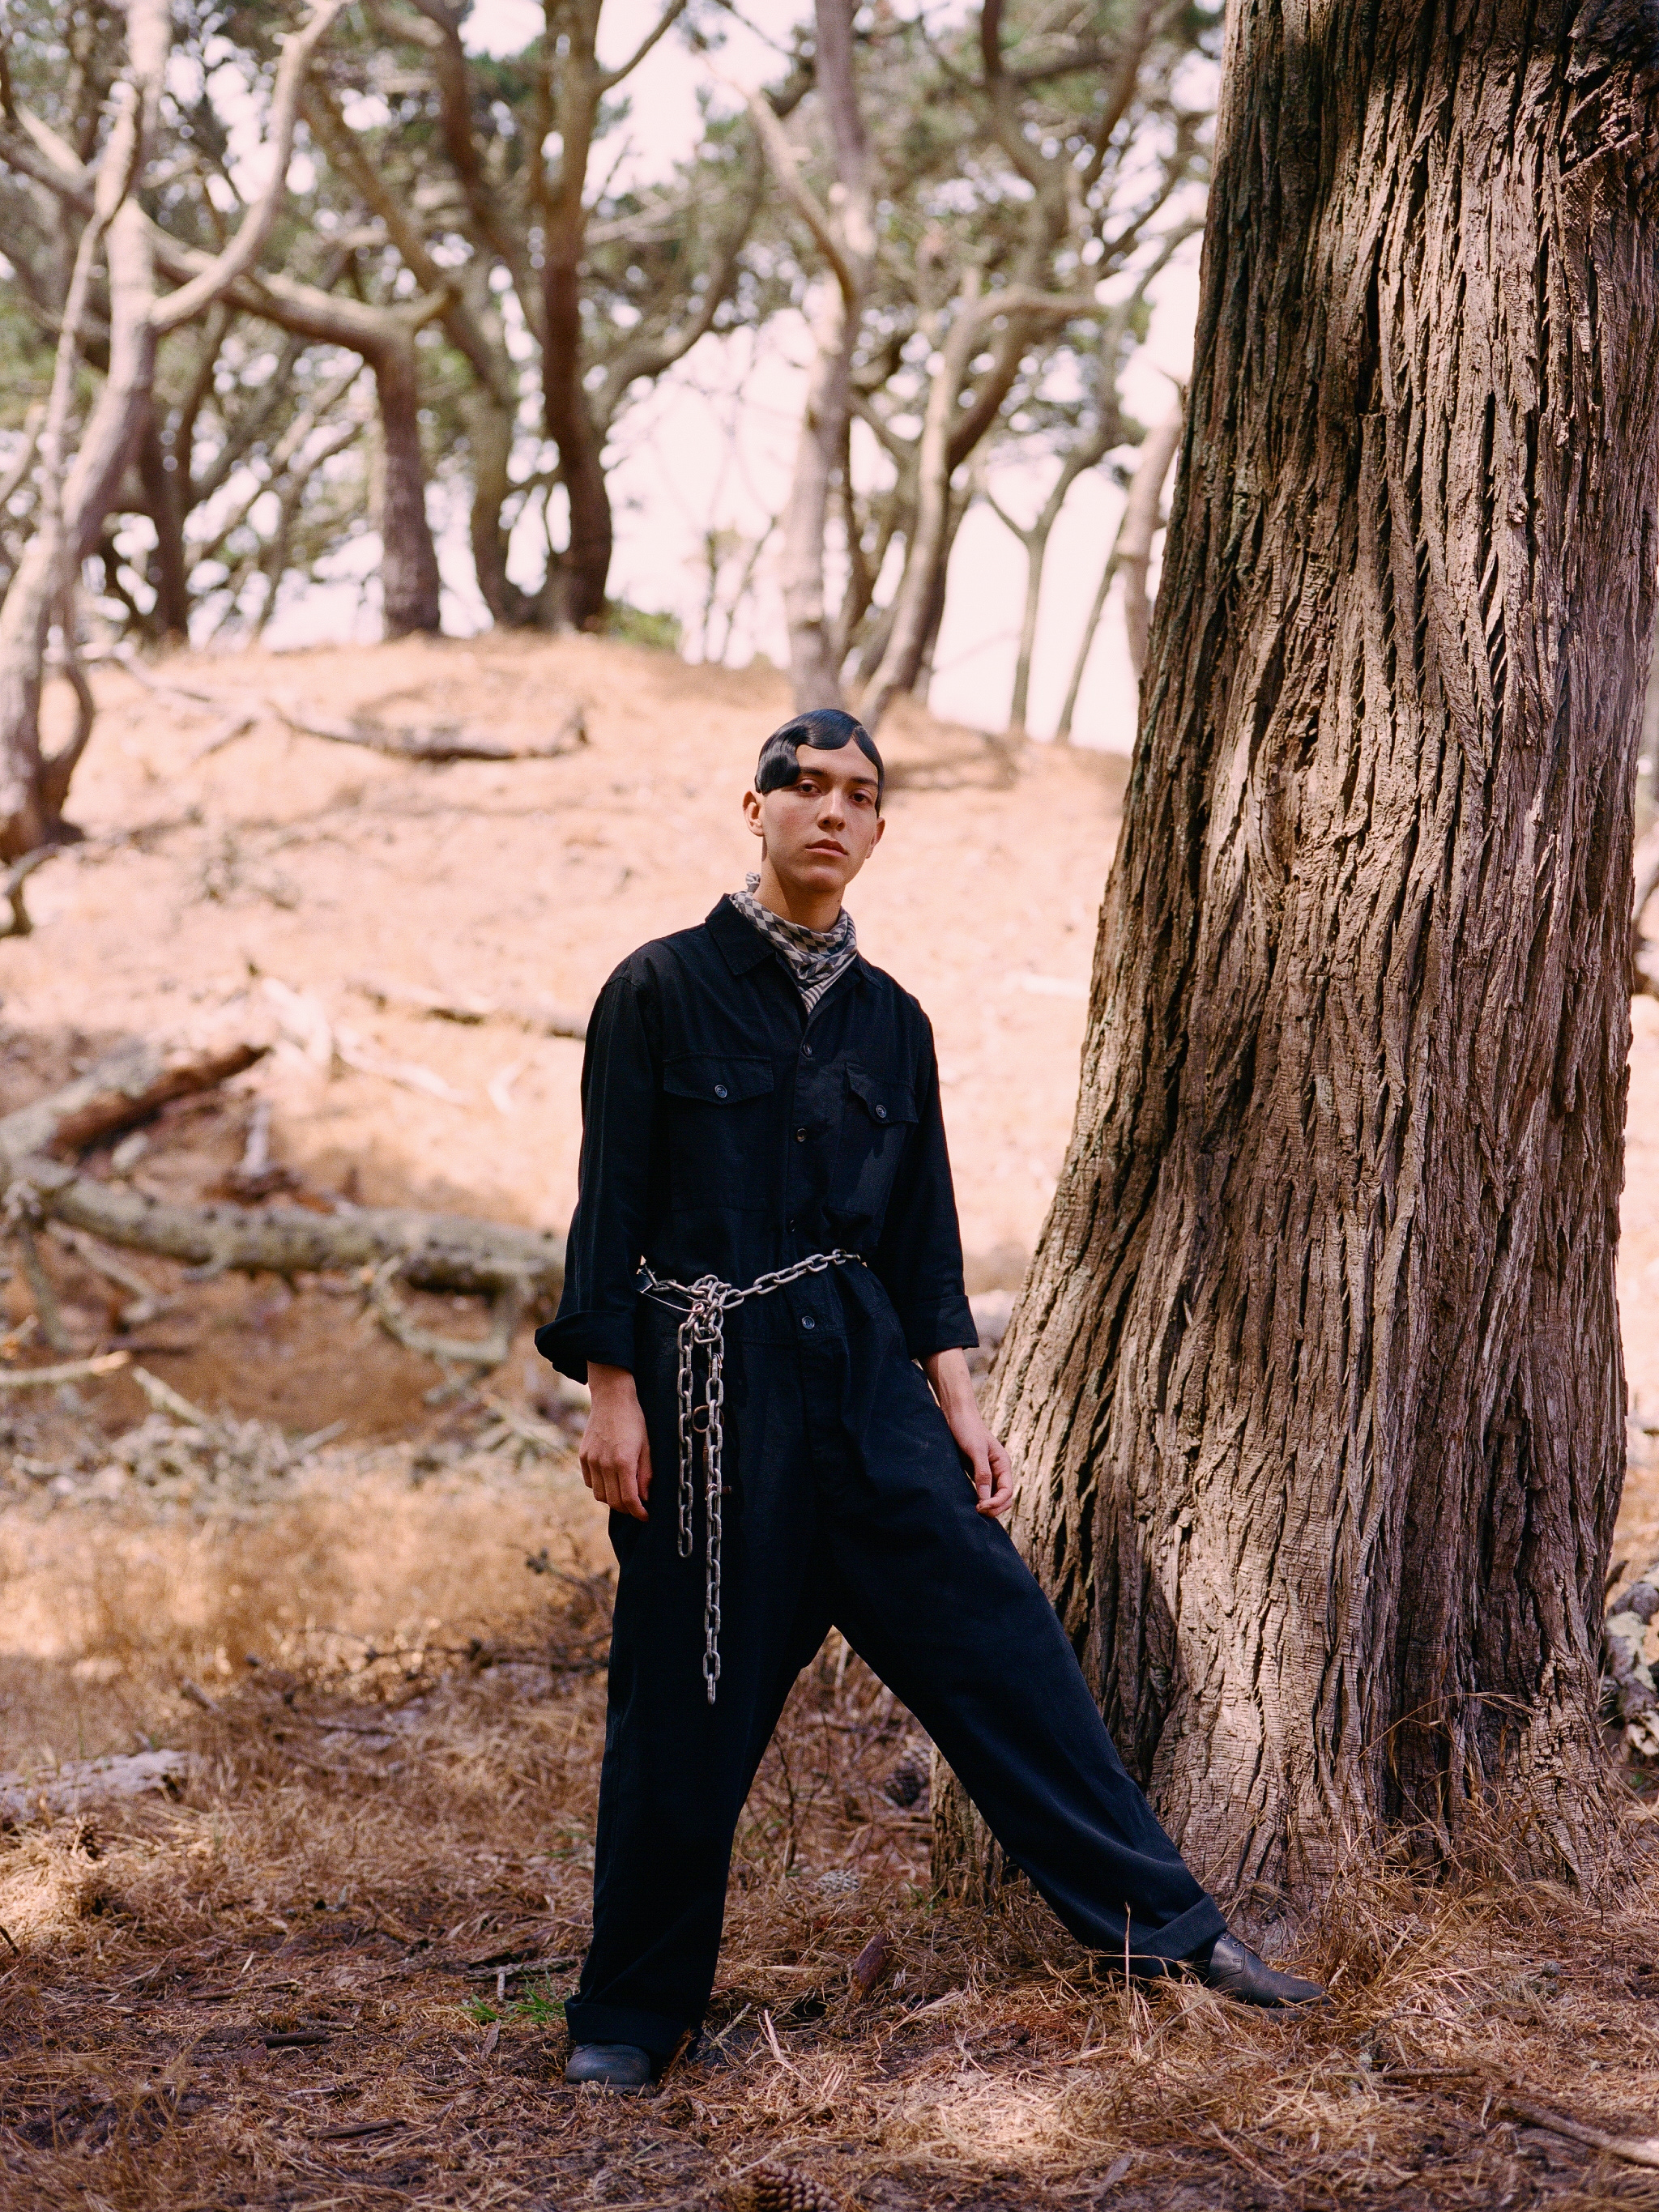 Jumpsuit, Westerlind; Bandana, StyleKouncil vintage